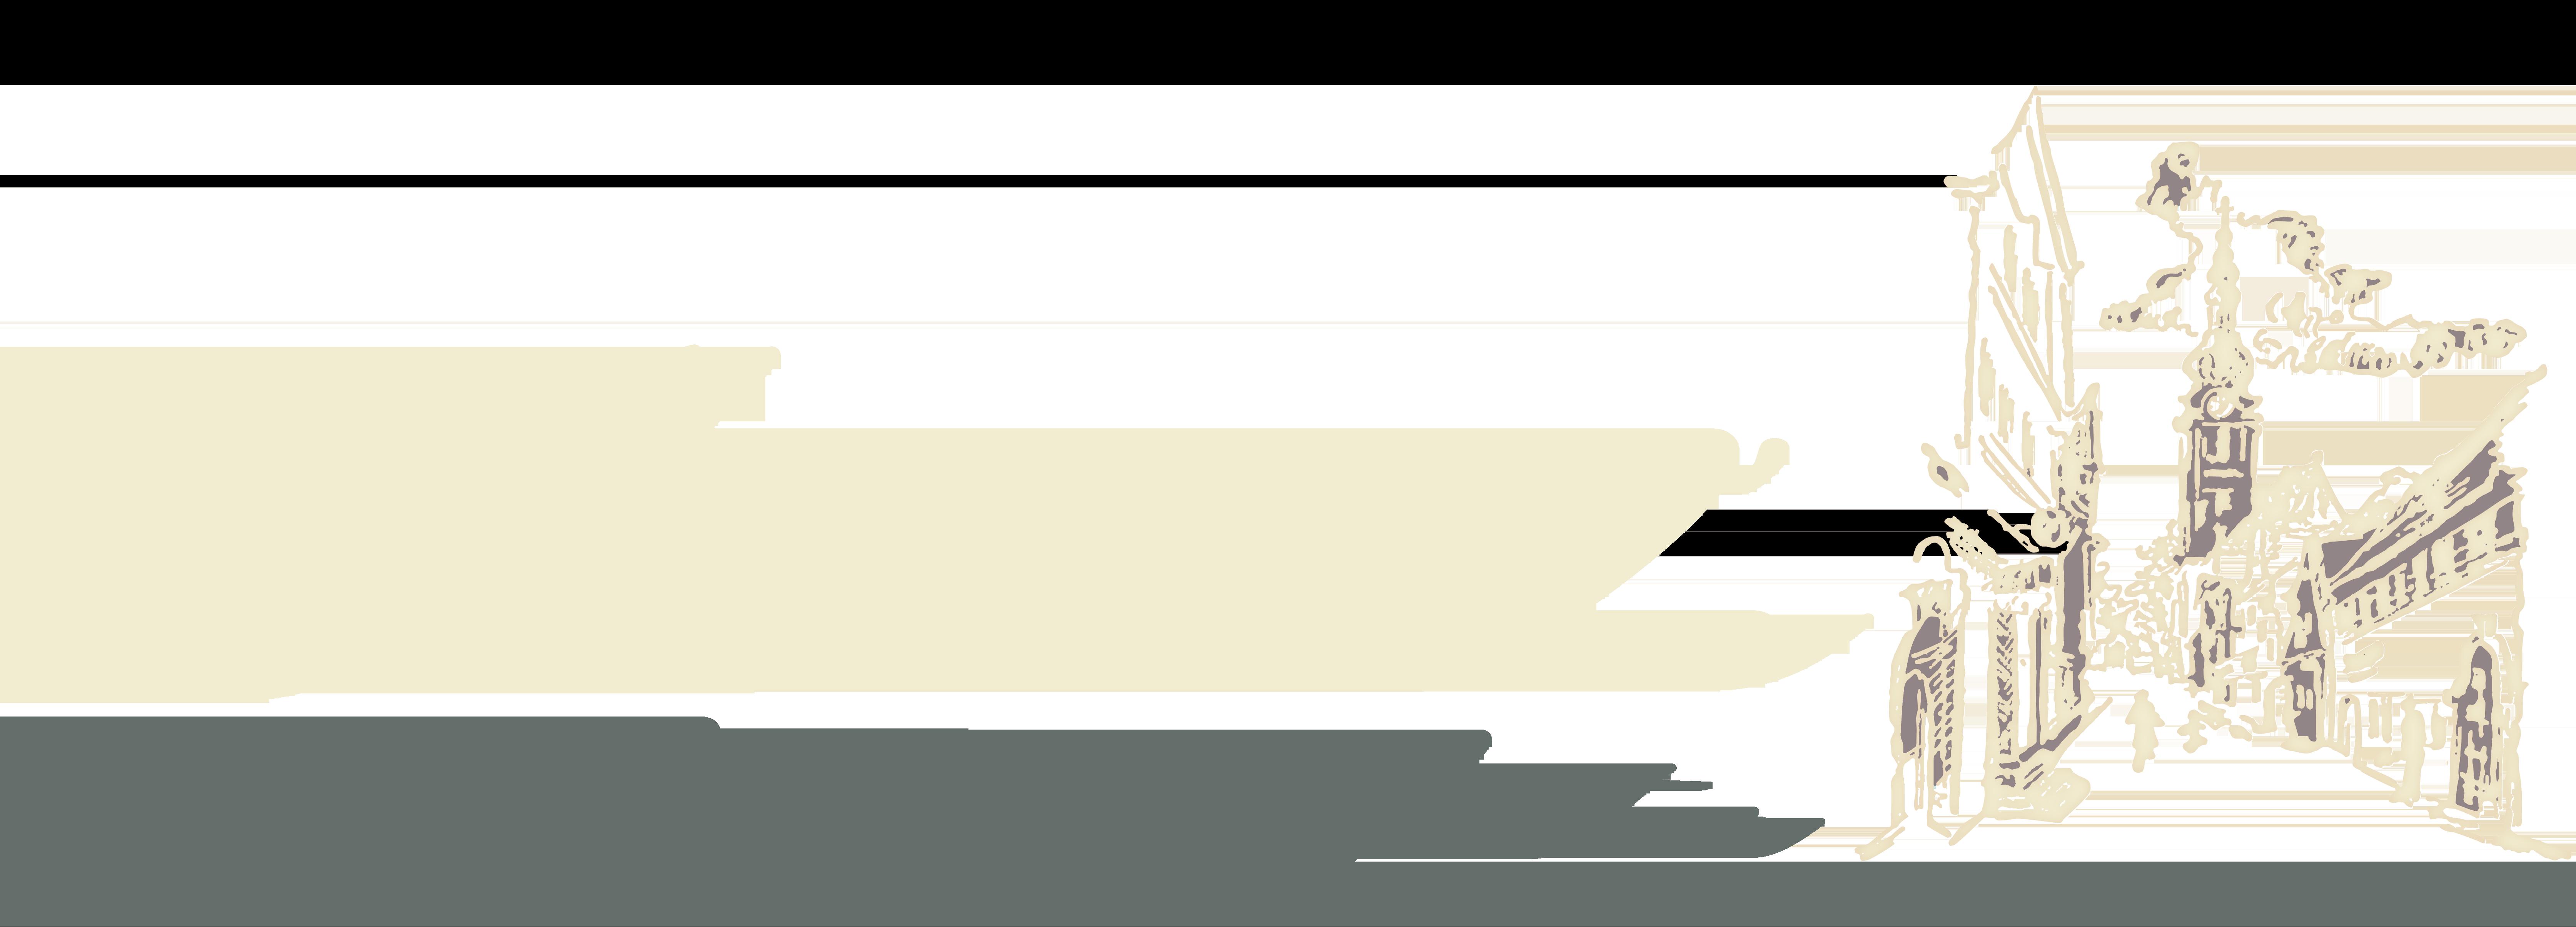 https://www.hummels-krapferl.at/wp-content/uploads/2019/04/NEG_LOGO.png